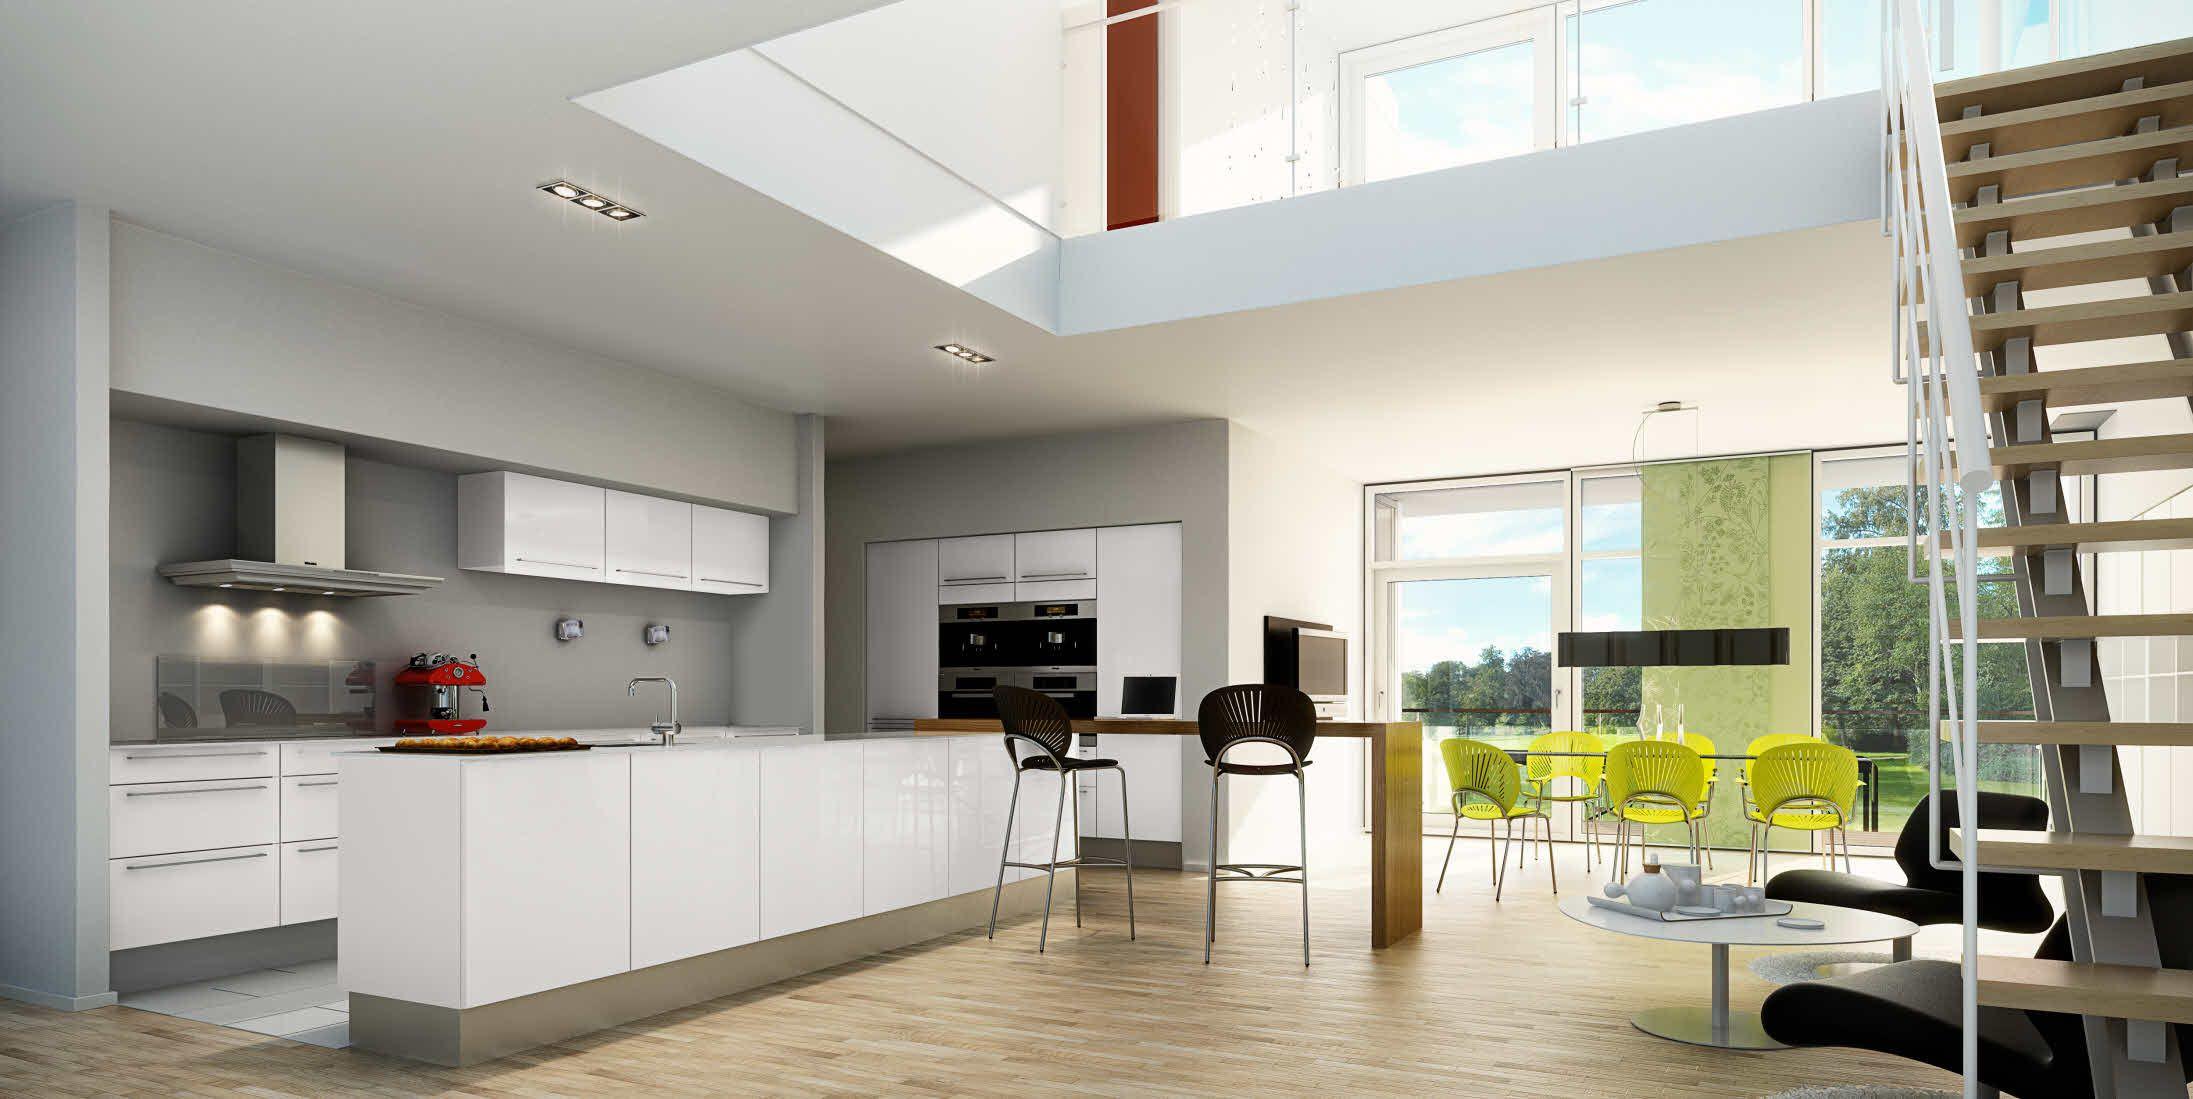 Emejing Cuisines Modernes Blanches Et Taupe Images - Design Trends ...